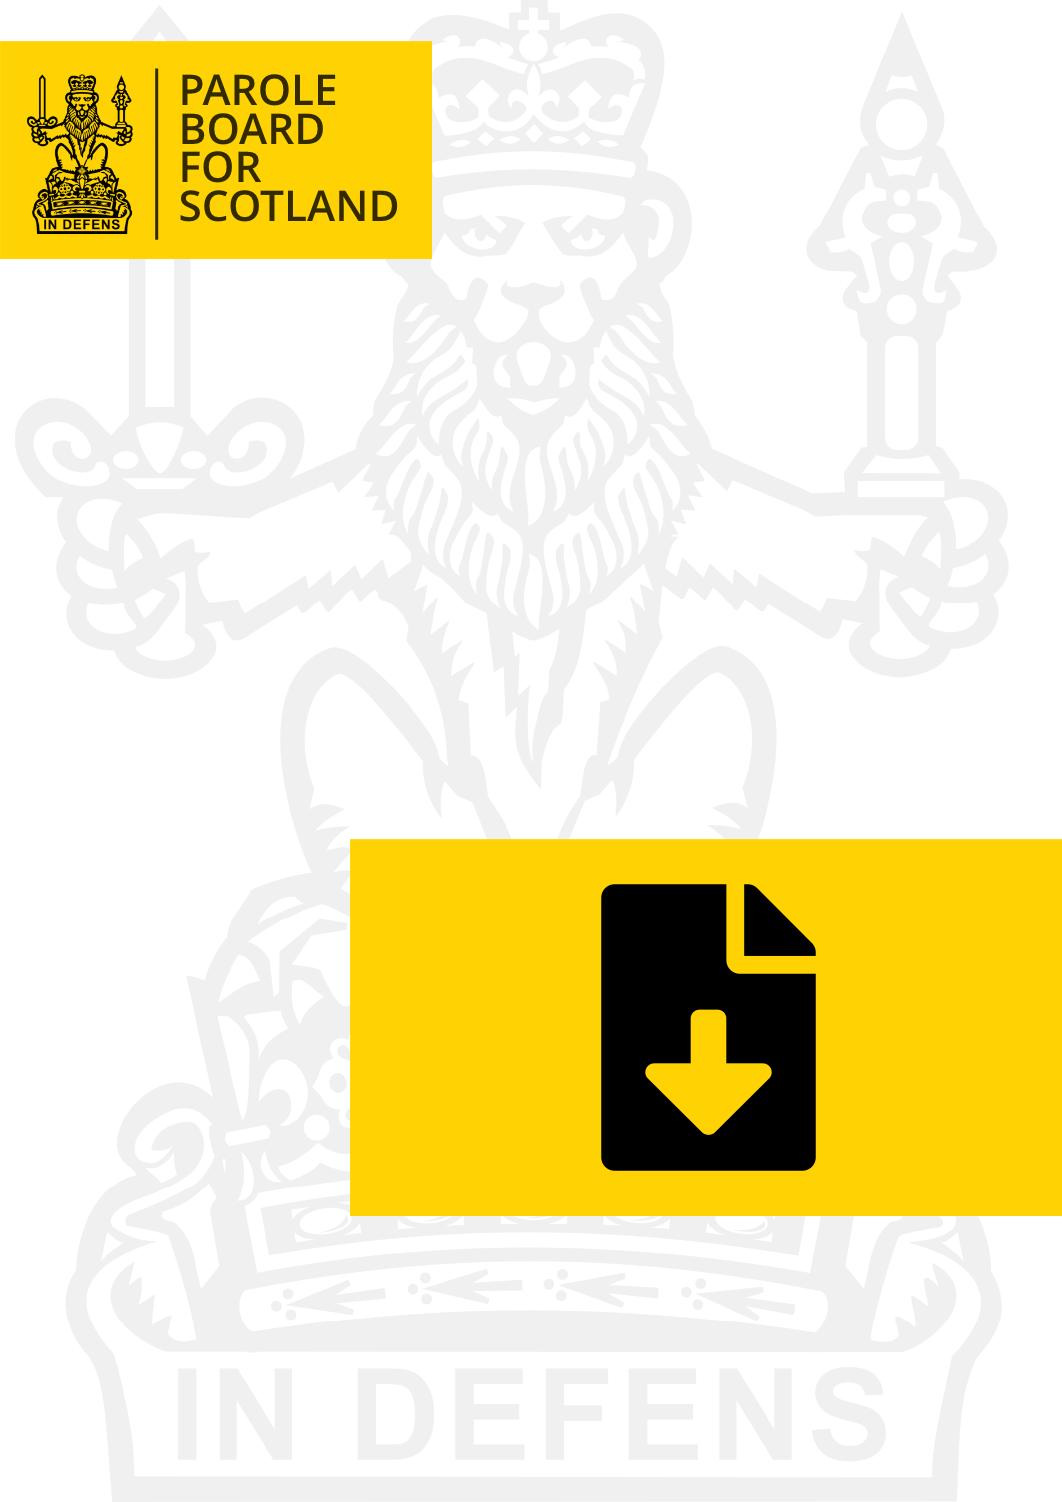 Parole Board Scheme of Delegation - Cover image